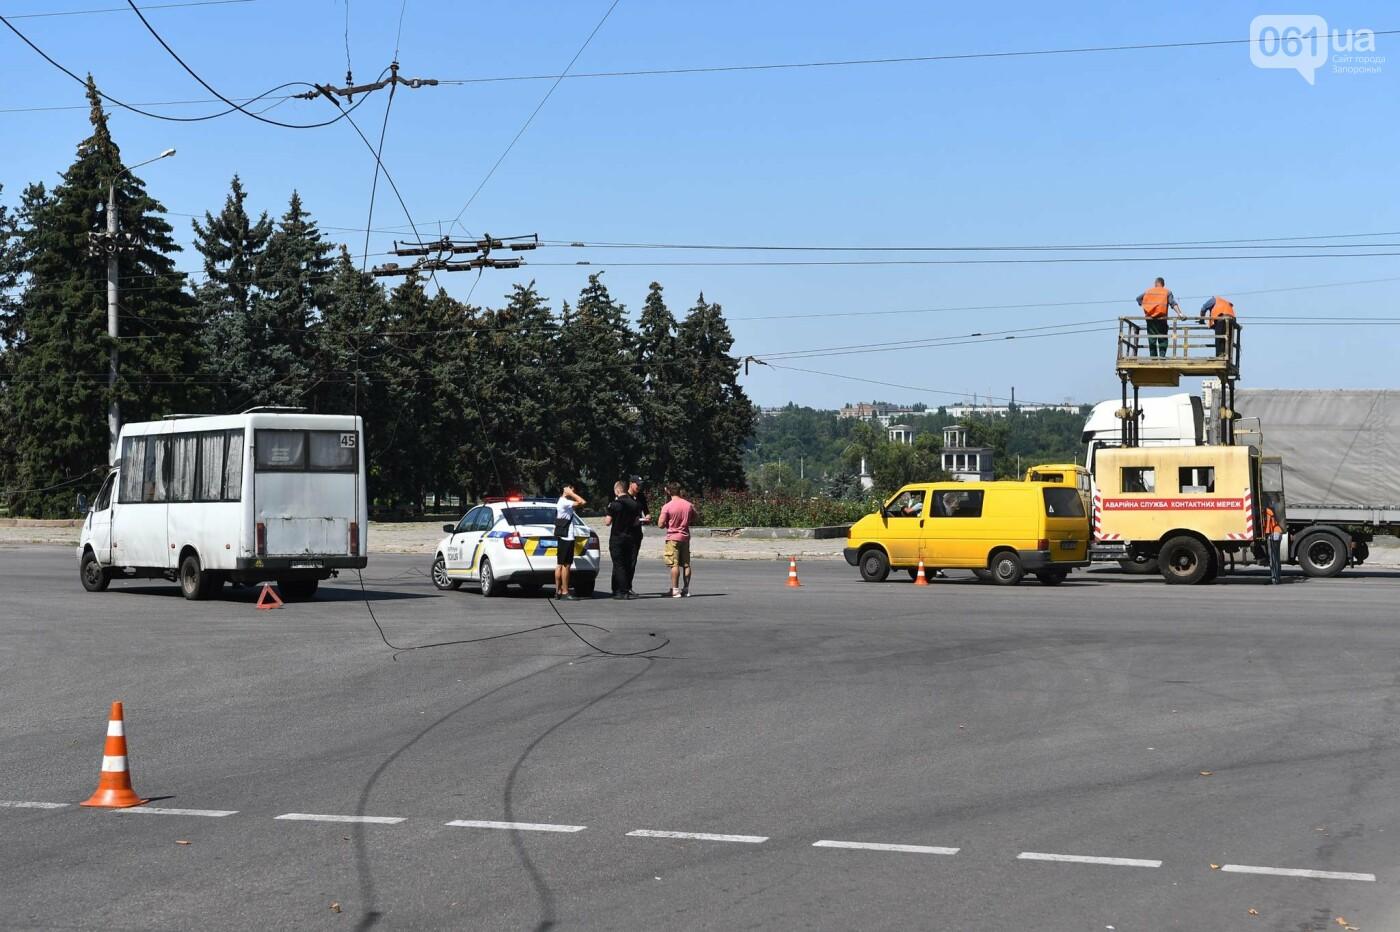 В Запорожье фура оборвала троллеи - провода упали на маршрутку, - ФОТО, фото-3